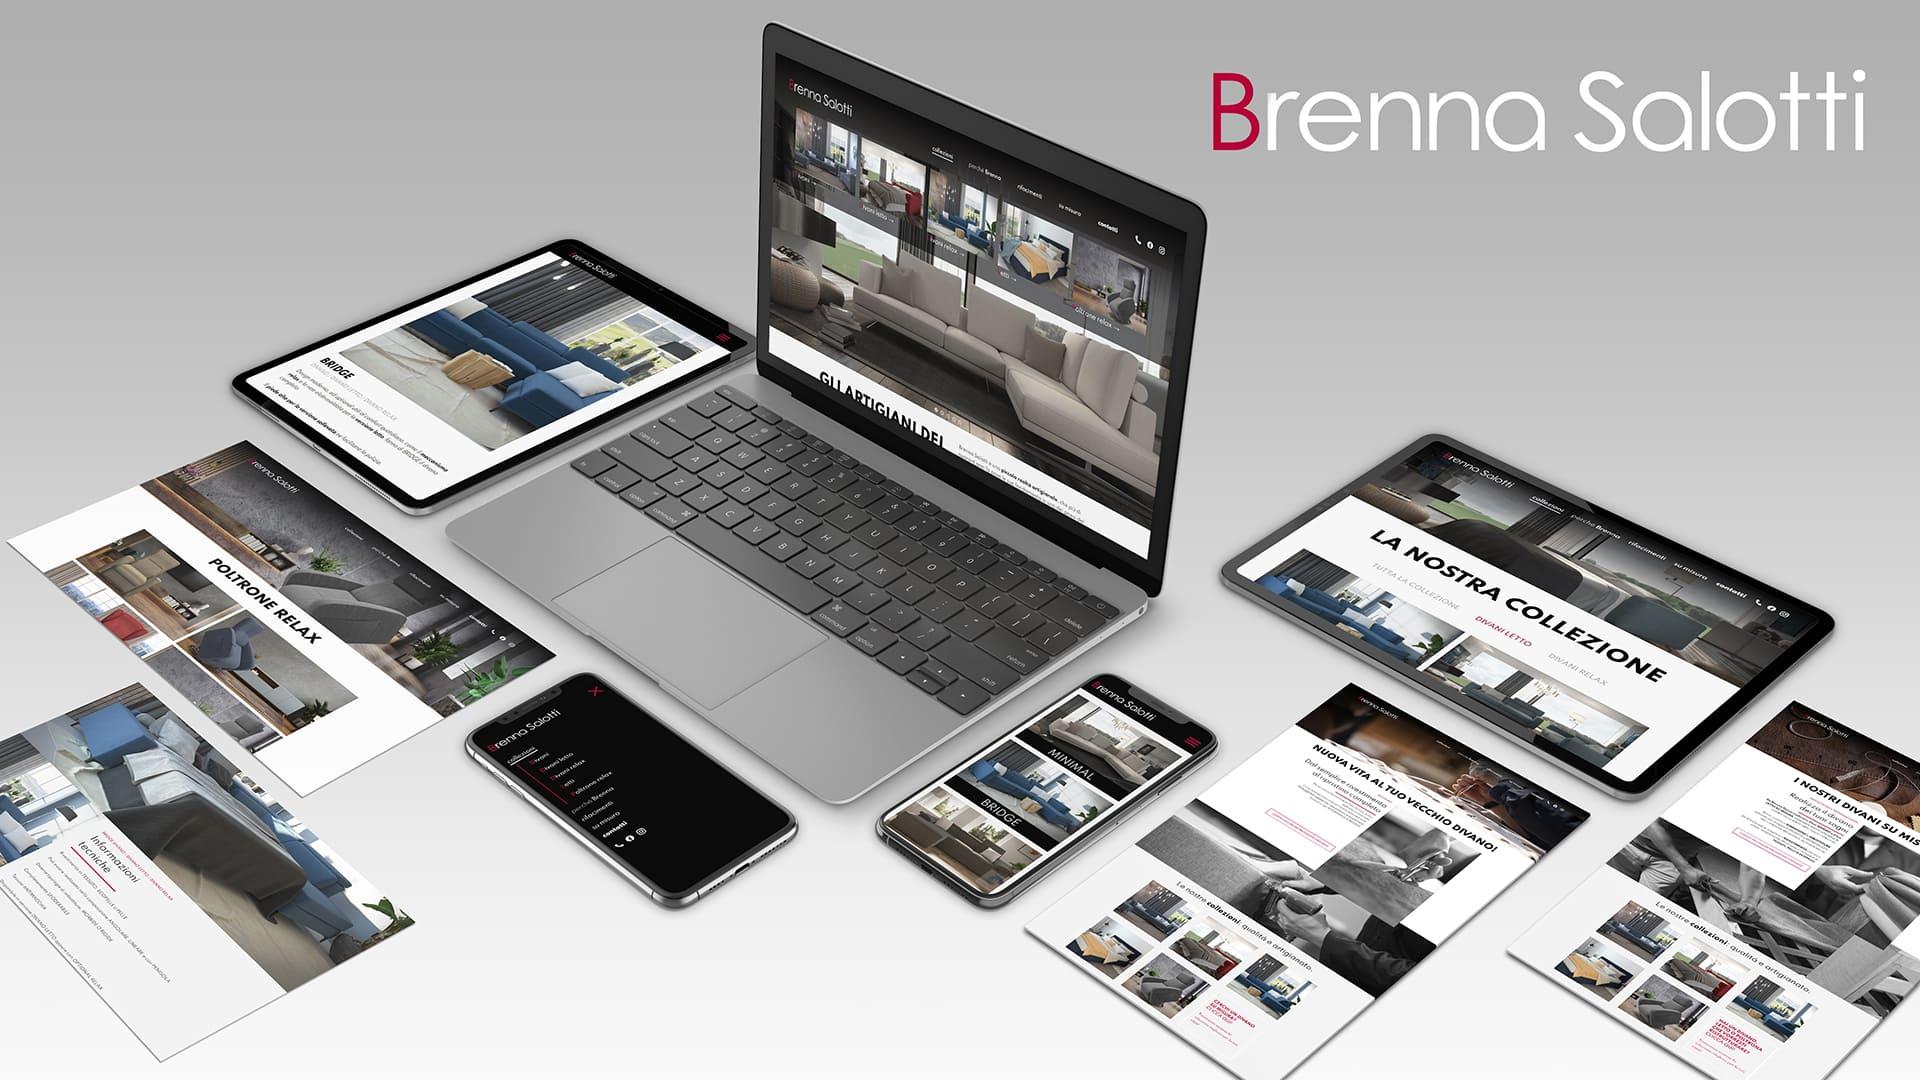 hubmira portfolio 2021 web digital brenna salotti sito milano